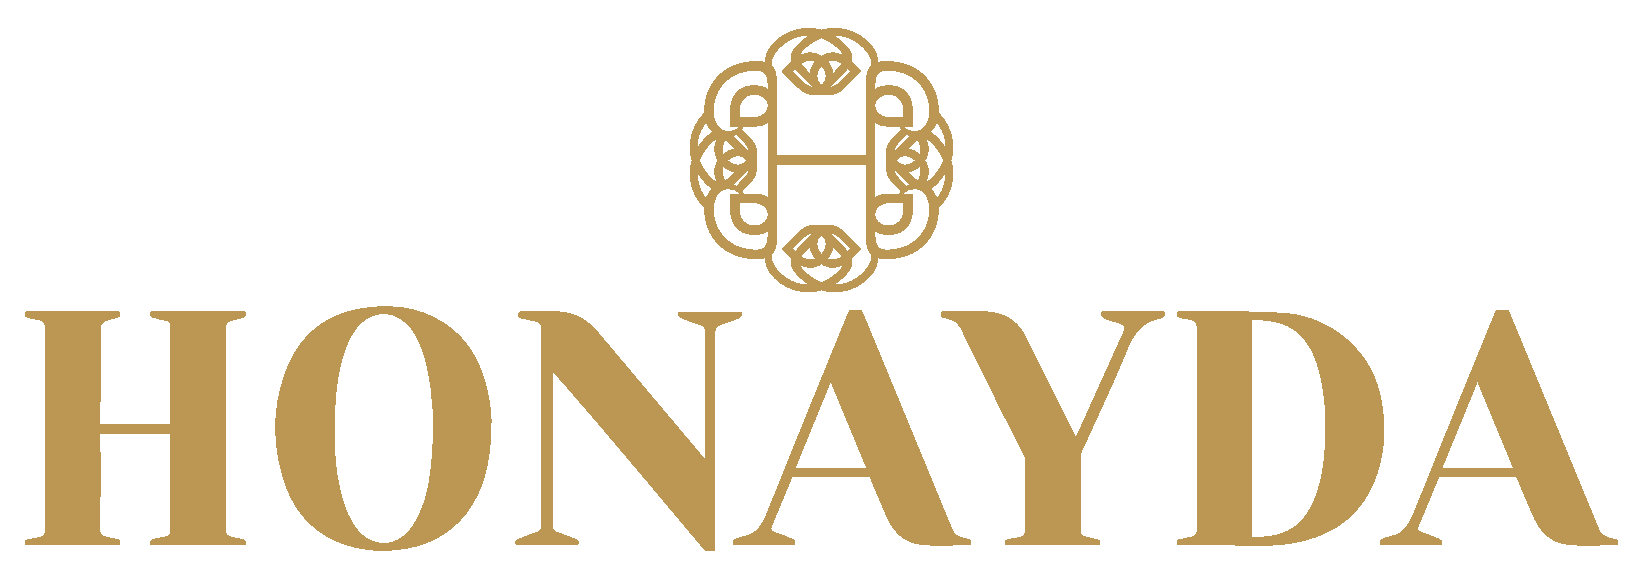 Honayda Logo.jpg